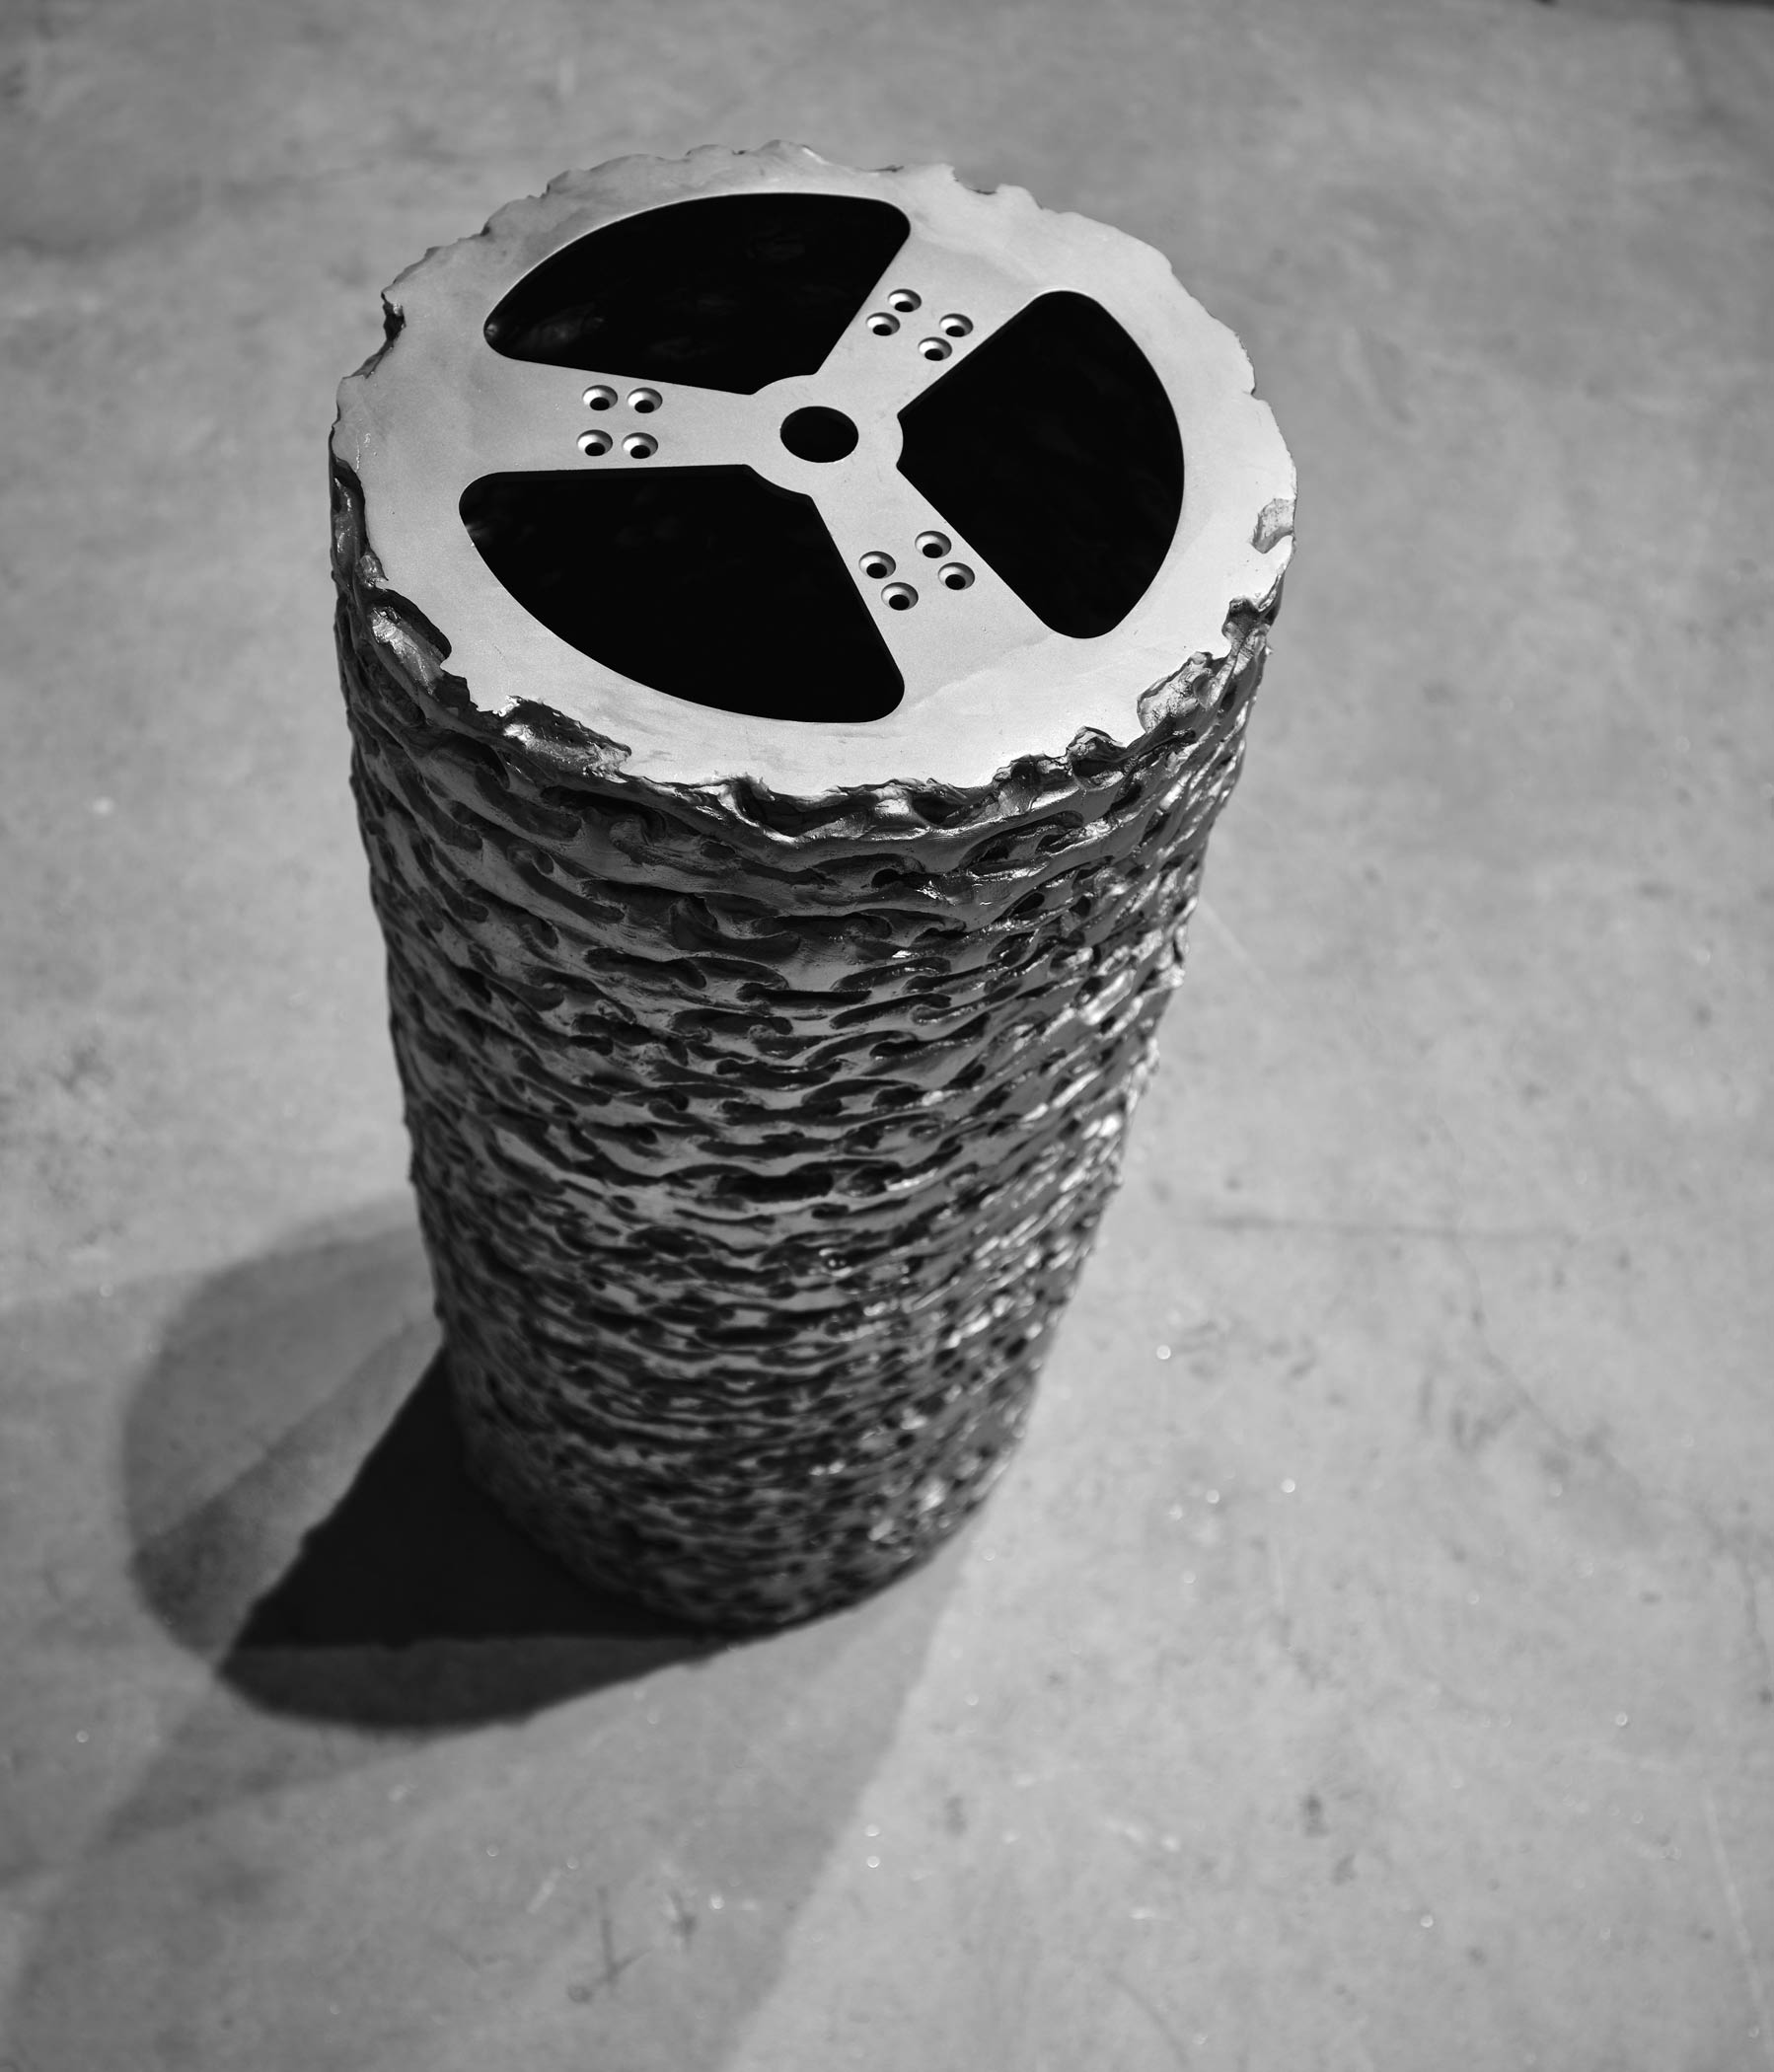 Matriz (base) 2019. Obra, en acero inoxidable,del escultor Asier Mendizabal, producida en Alfa Arte.